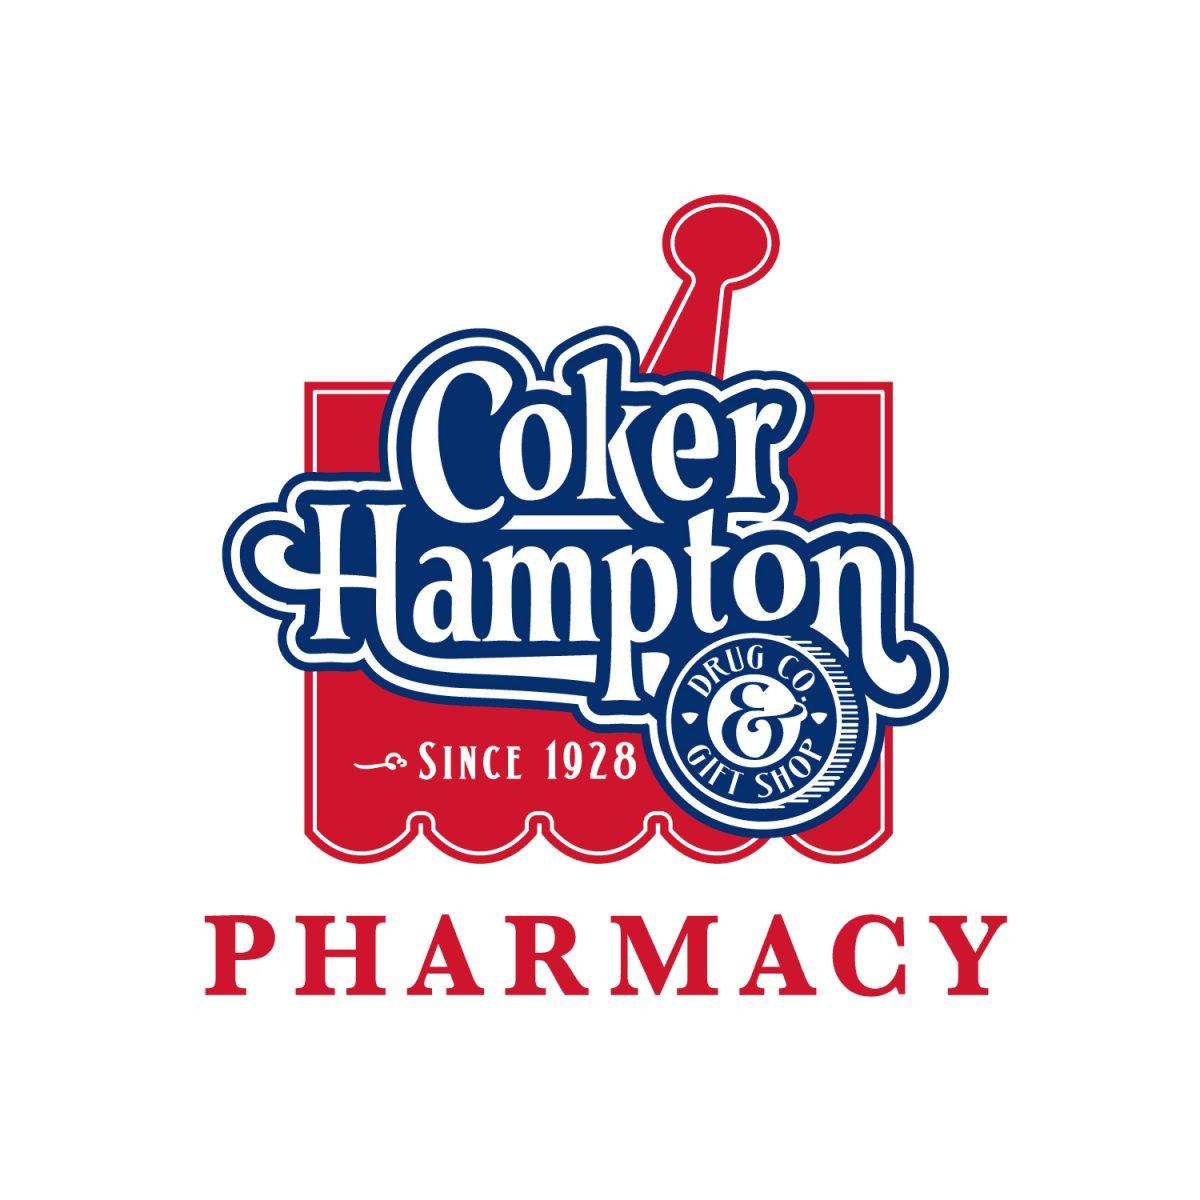 Coker Hampton Pharmacy logo